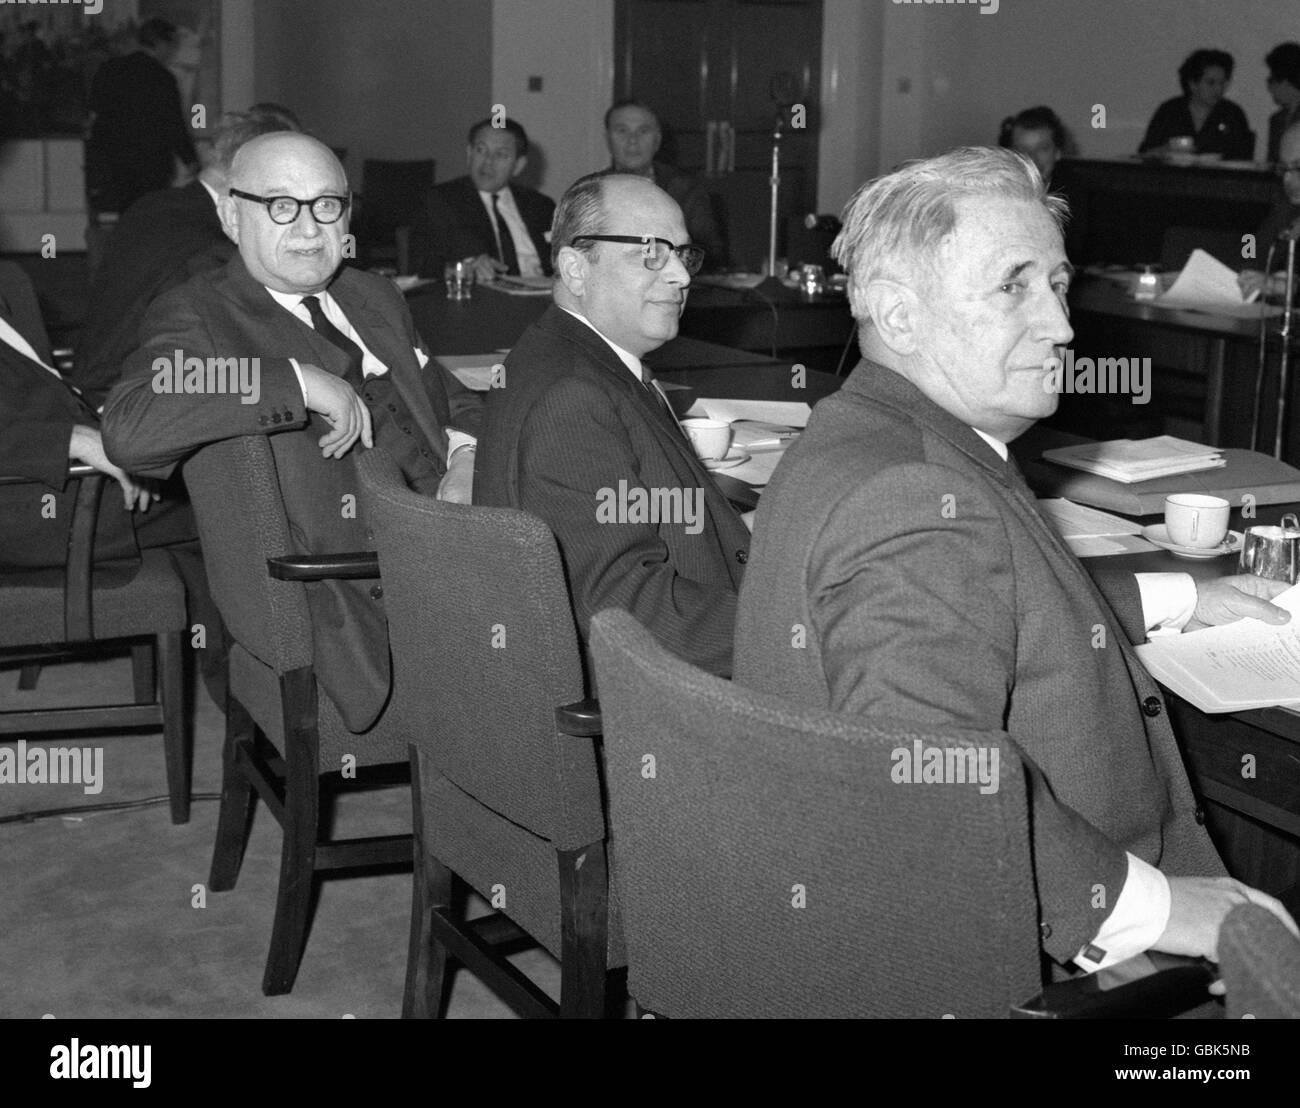 International Politics - World Jewish Congress - London - 1965 - Stock Image